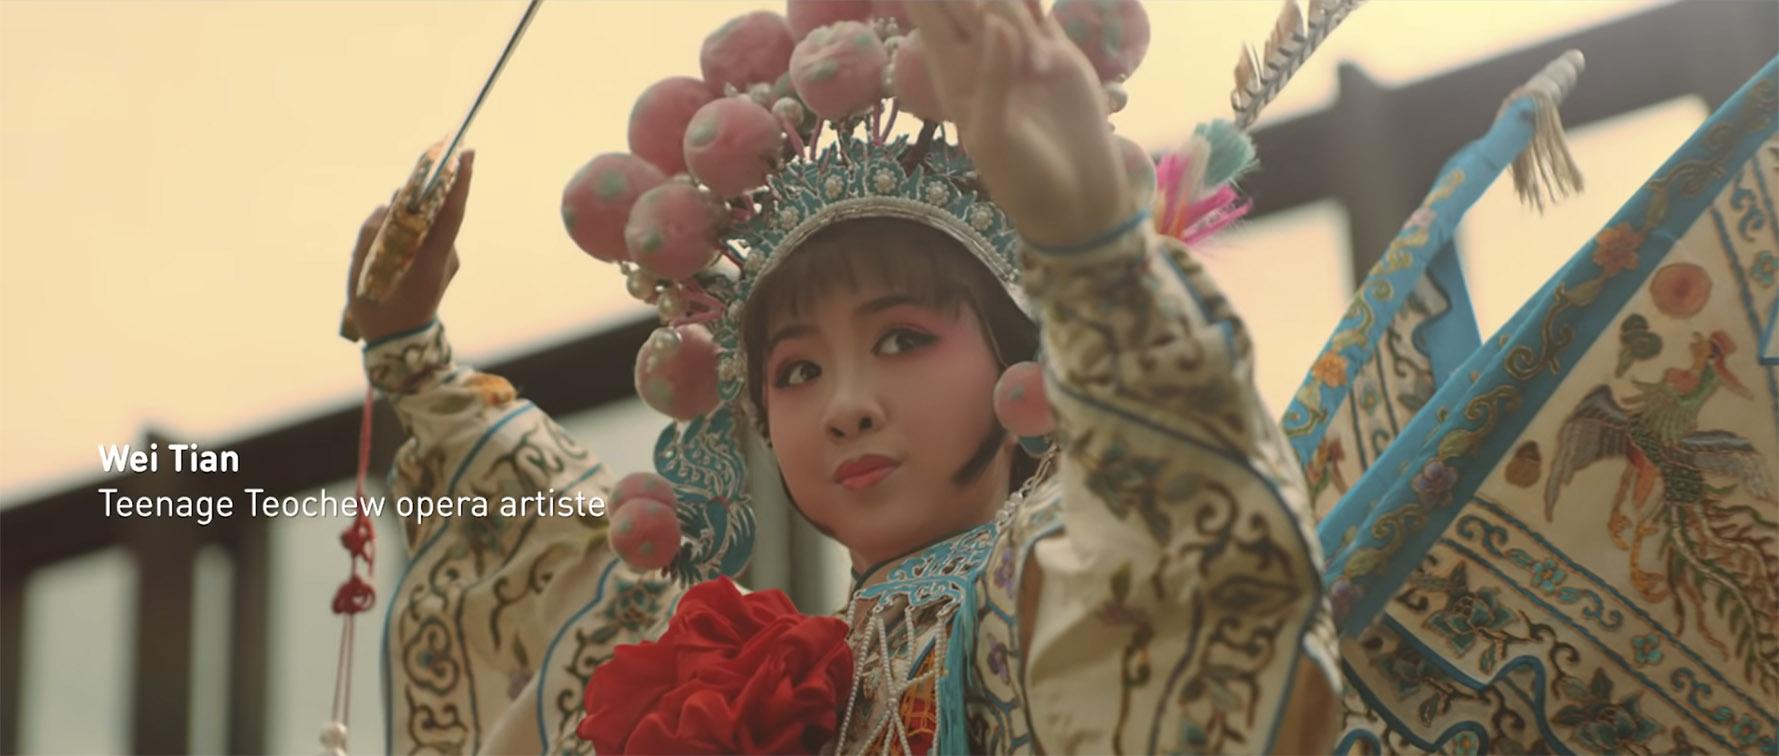 Dentsu Singapore celebrates diversity in profile stories rebranding campaign for M1